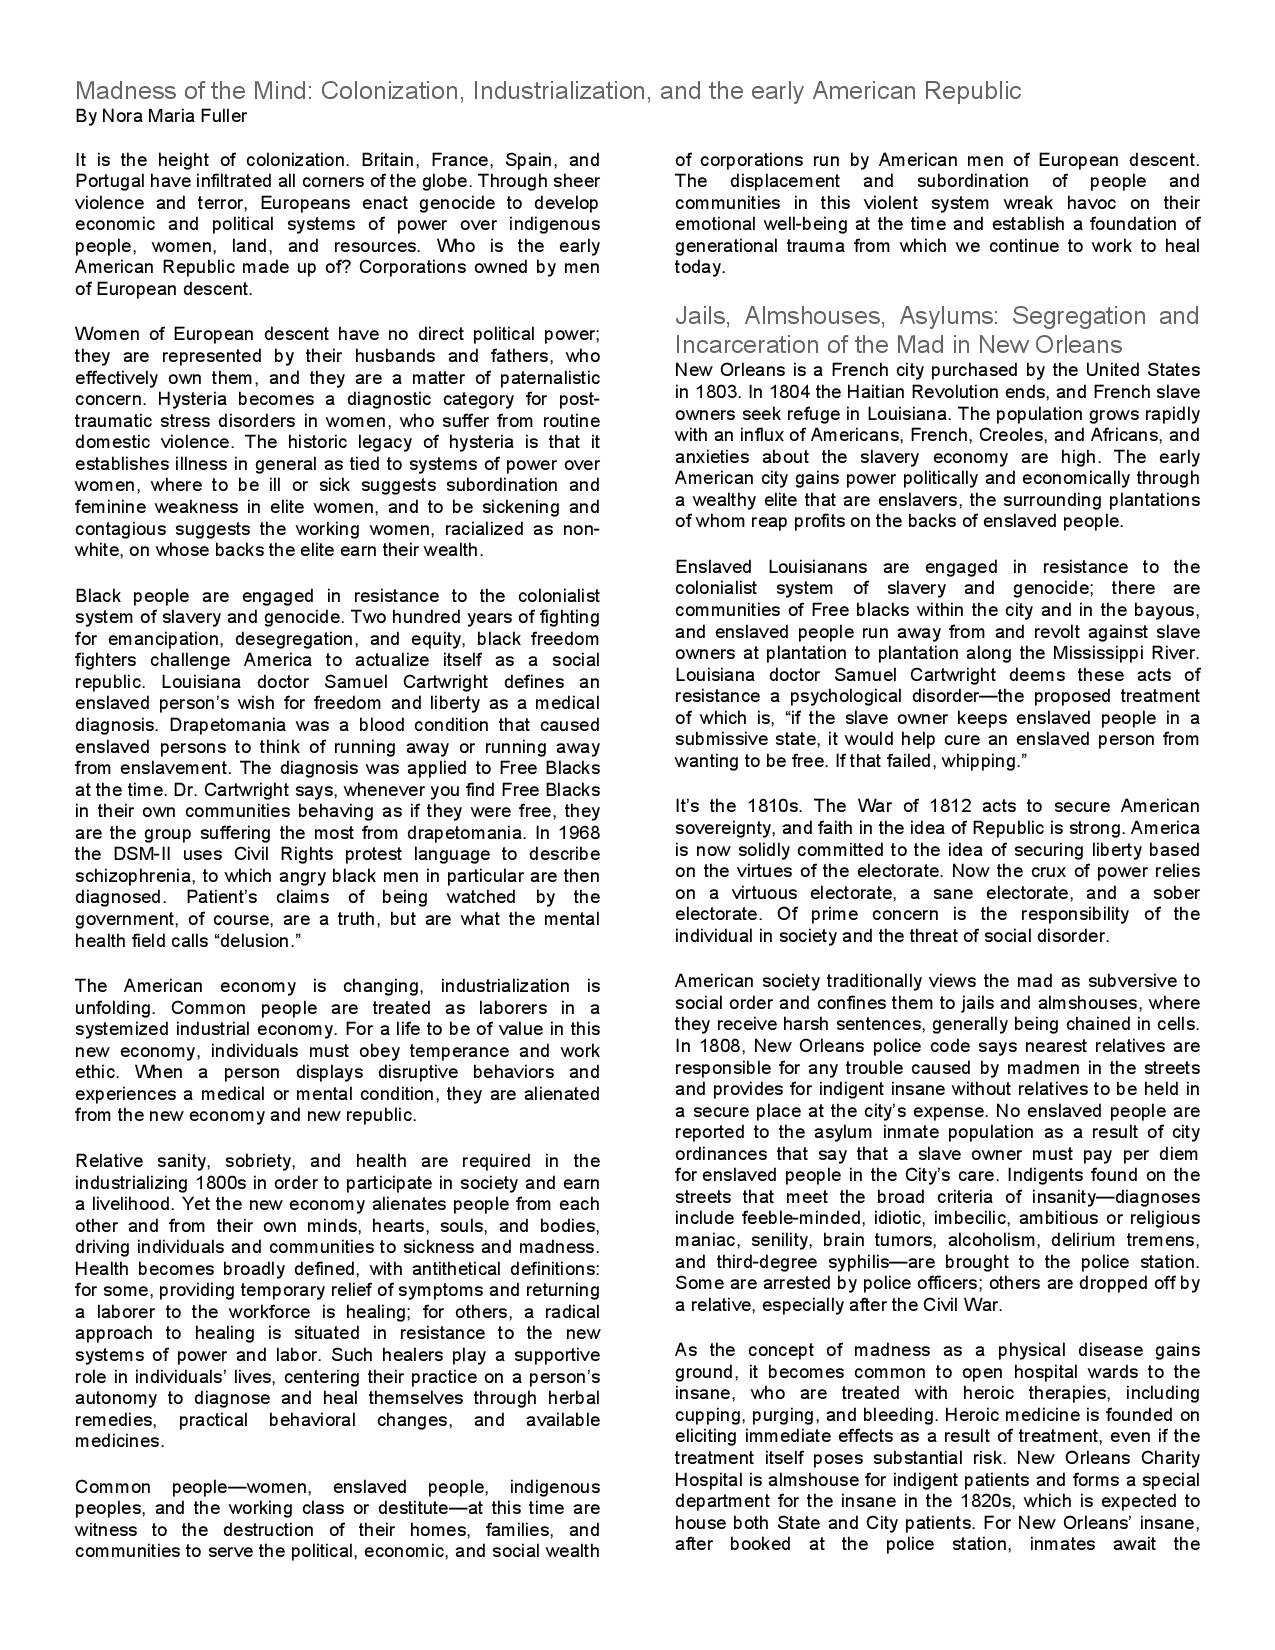 Timeline-page-003.jpg